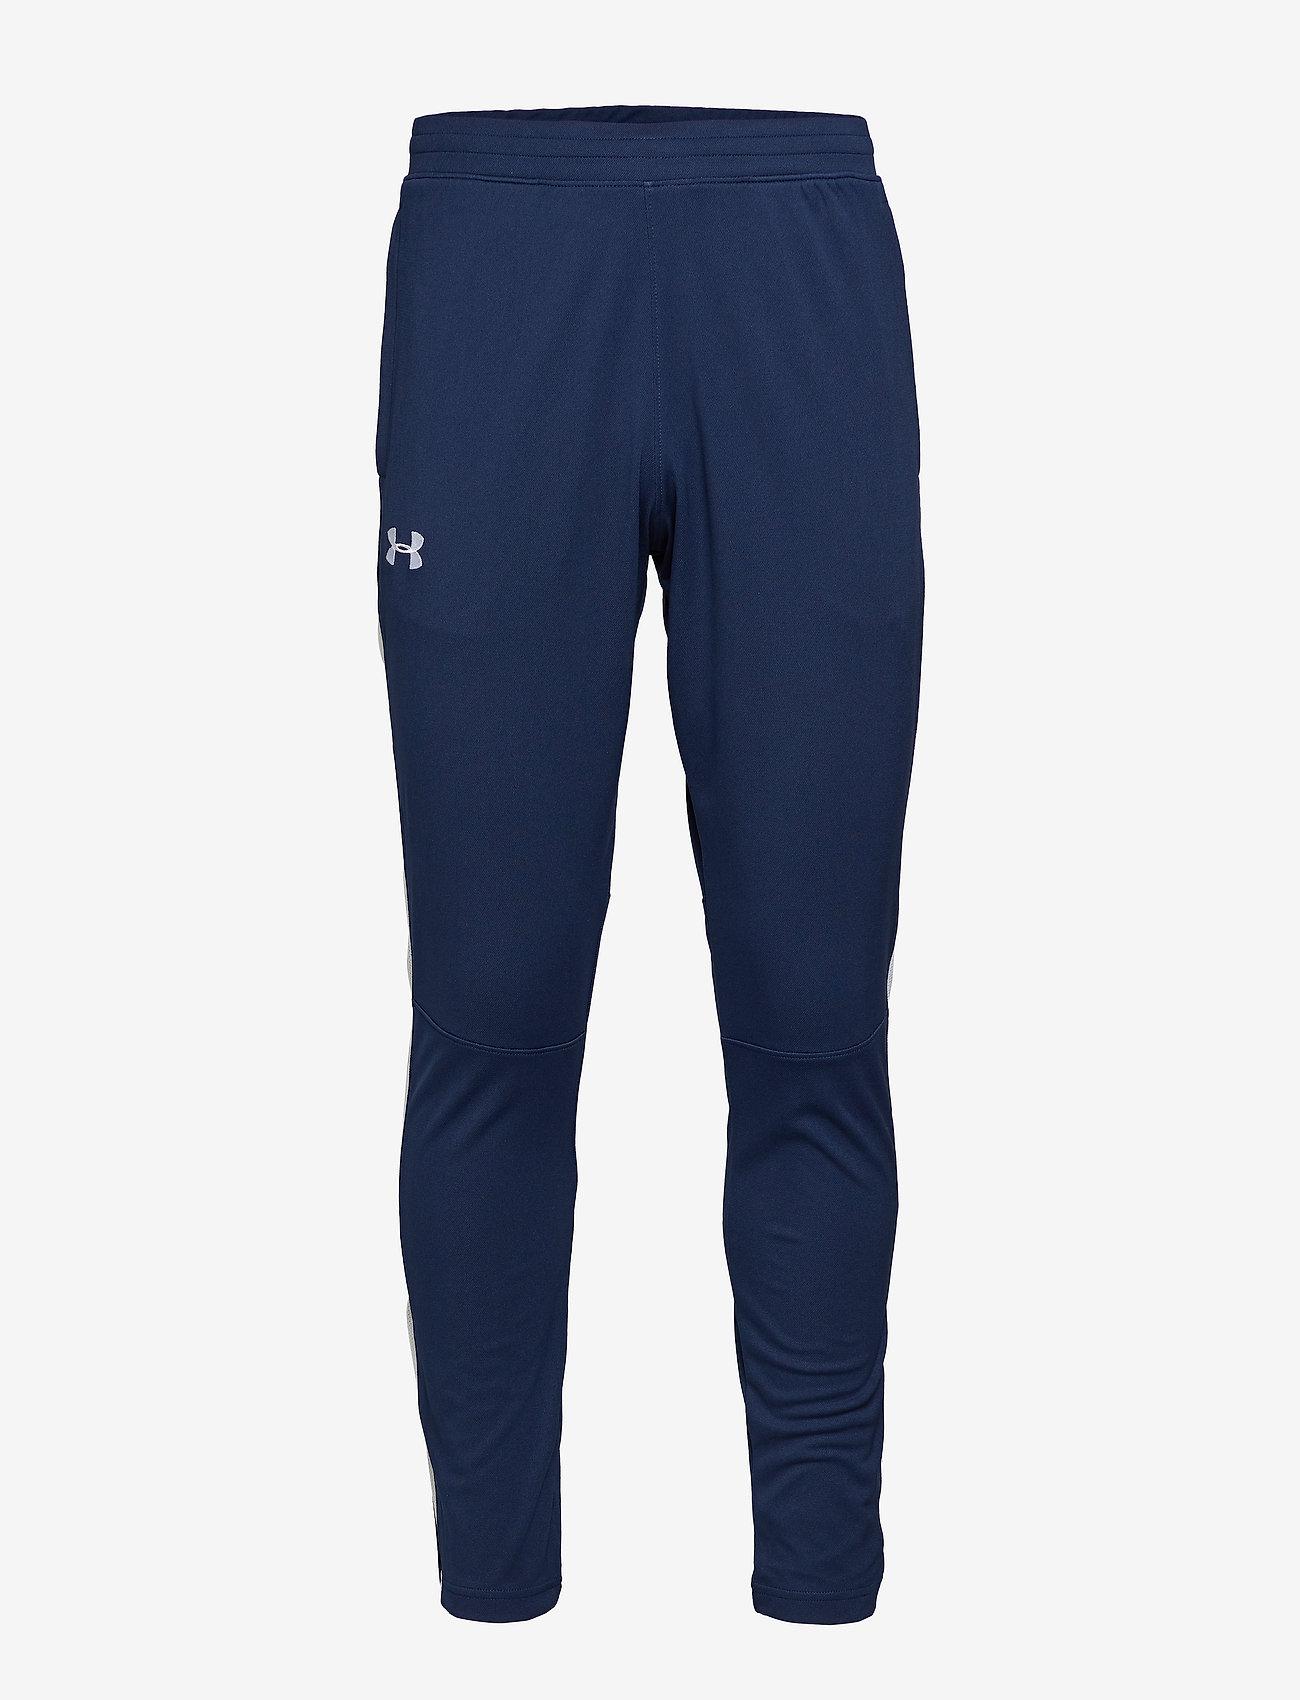 Under Armour - SPORTSTYLE PIQUE TRACK PANT - spodnie treningowe - academy - 0